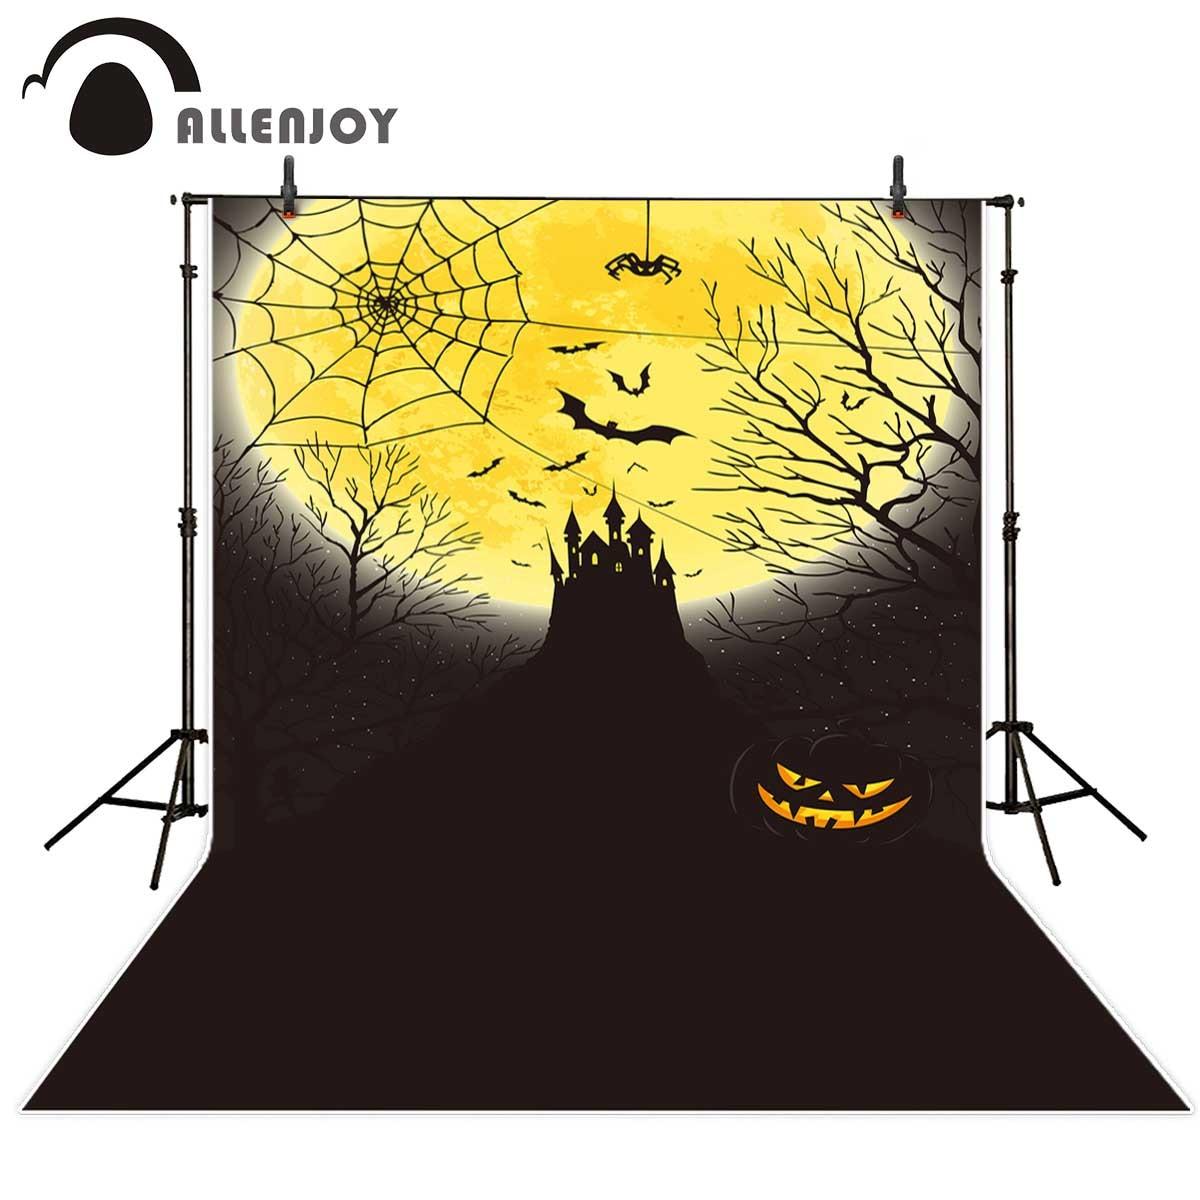 Allenjoy Halloween backdrop decoration castle moon spider web bats evil pumpkin photography background fond studio photo  цена и фото